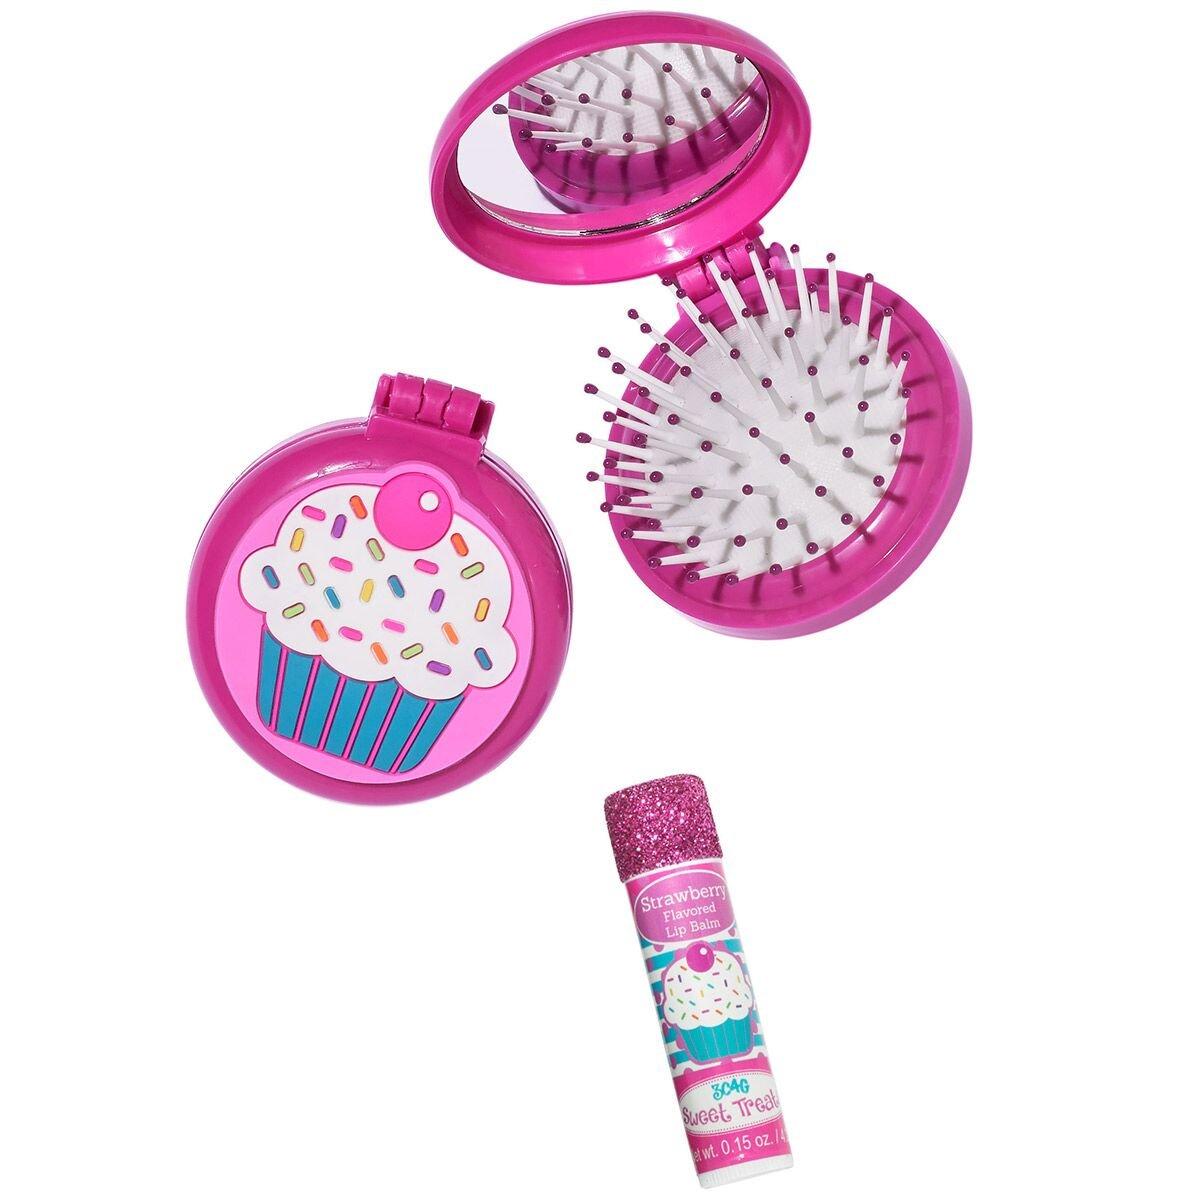 3C4G Cupcake Folding Brush and Mirror Set with Bonus Lip Balm